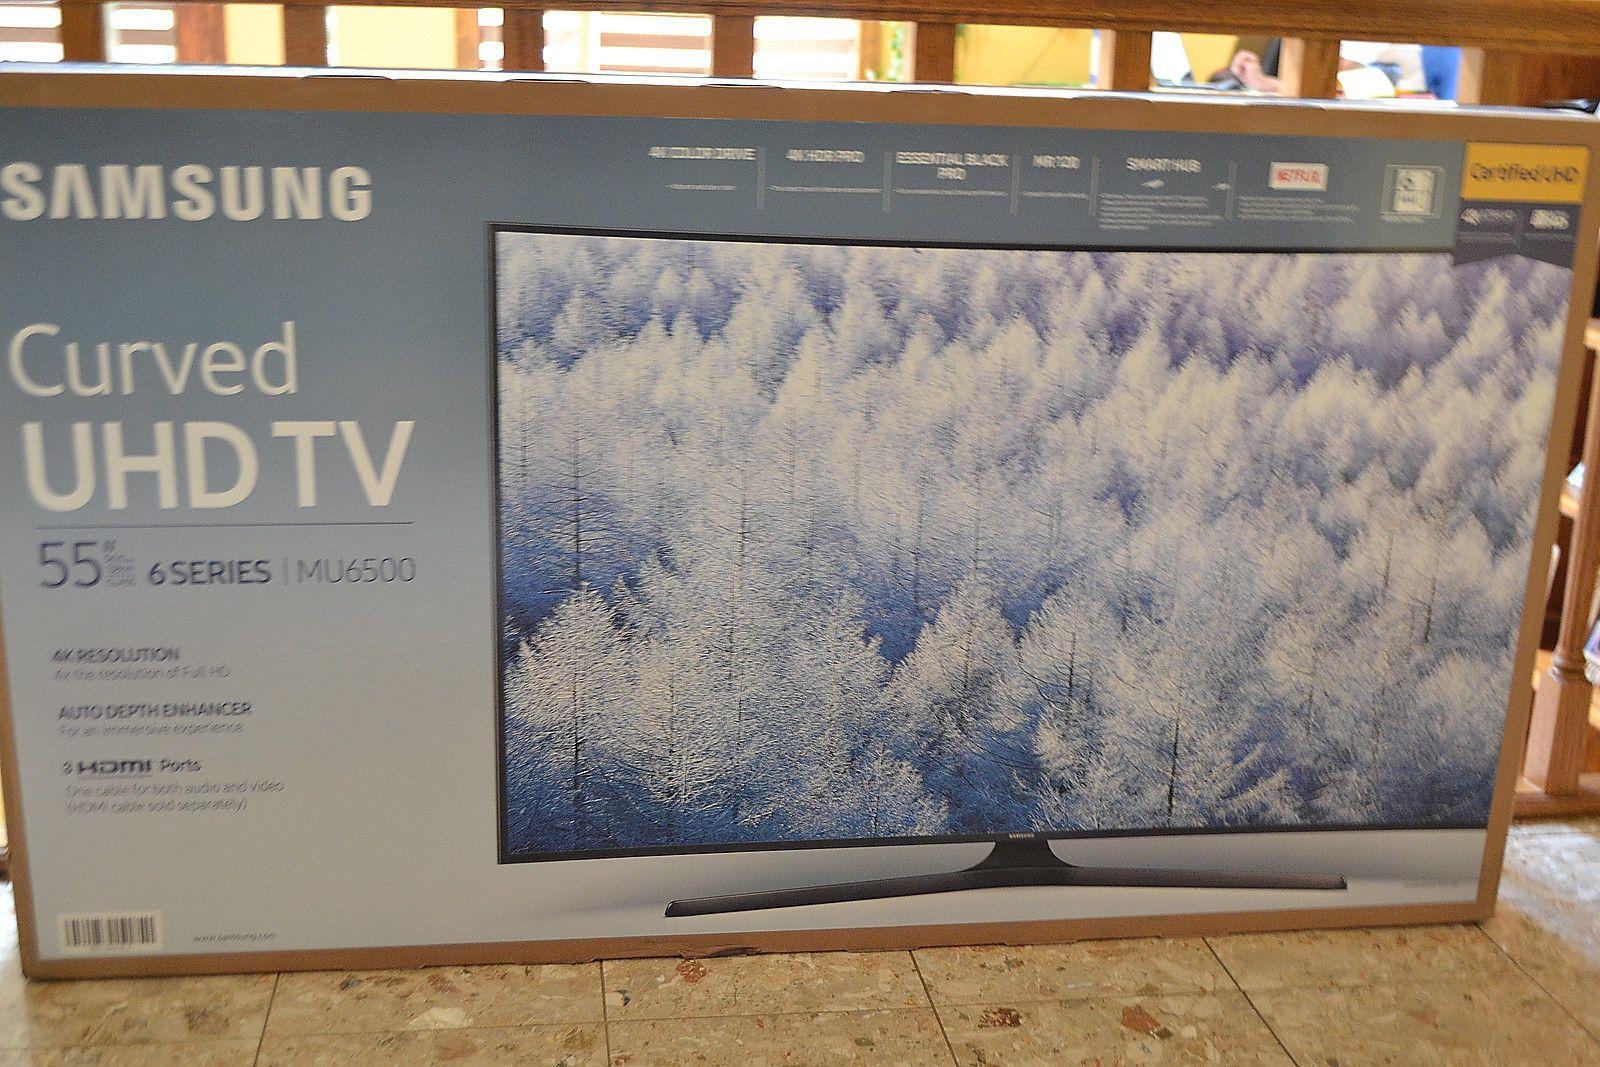 samsung tv remote 2017. samsung 55 inch curved 4k ultra hd tv/smart remote 2017 model un55mu6500 new tv